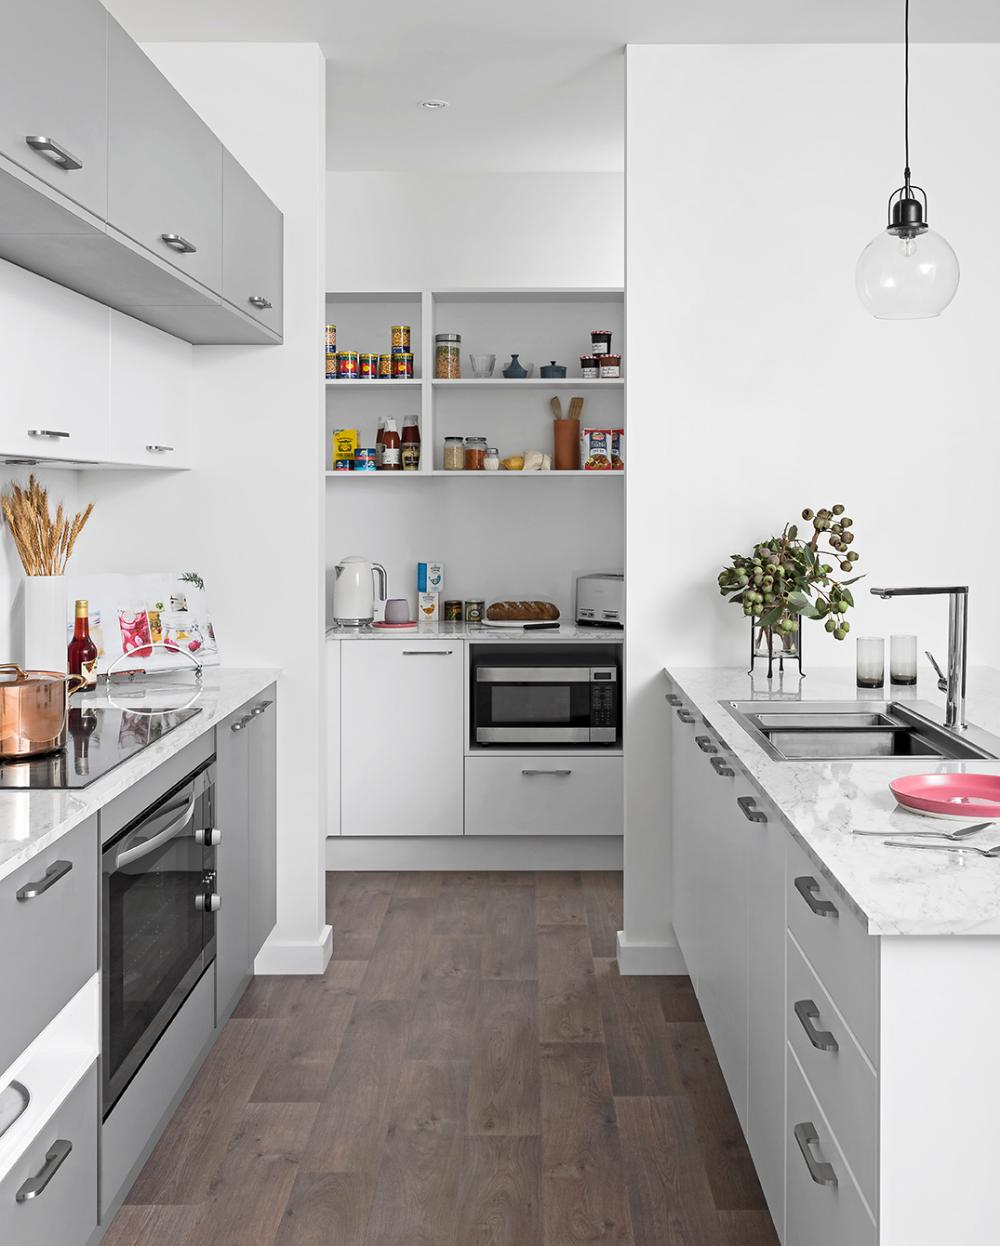 butler s pantry building blocks kaboodle kitchen kitchen inspirations best kitchen designs on kaboodle kitchen design id=12958